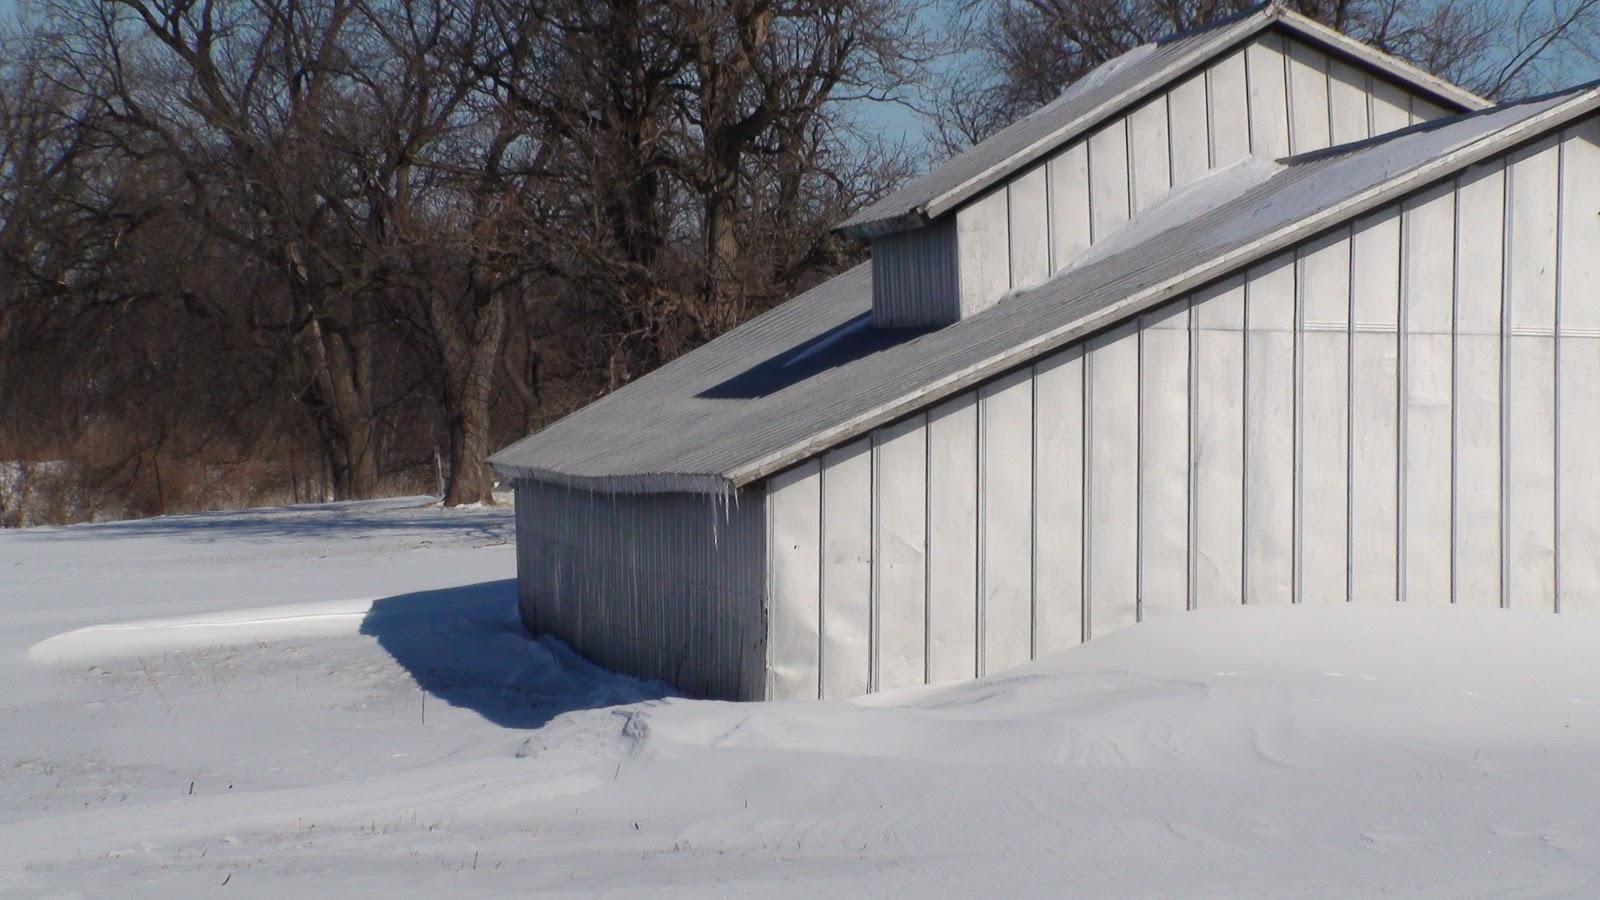 Illinois will county manhattan - Drifting Snow Around A Farm Building In Manhattan Illinois